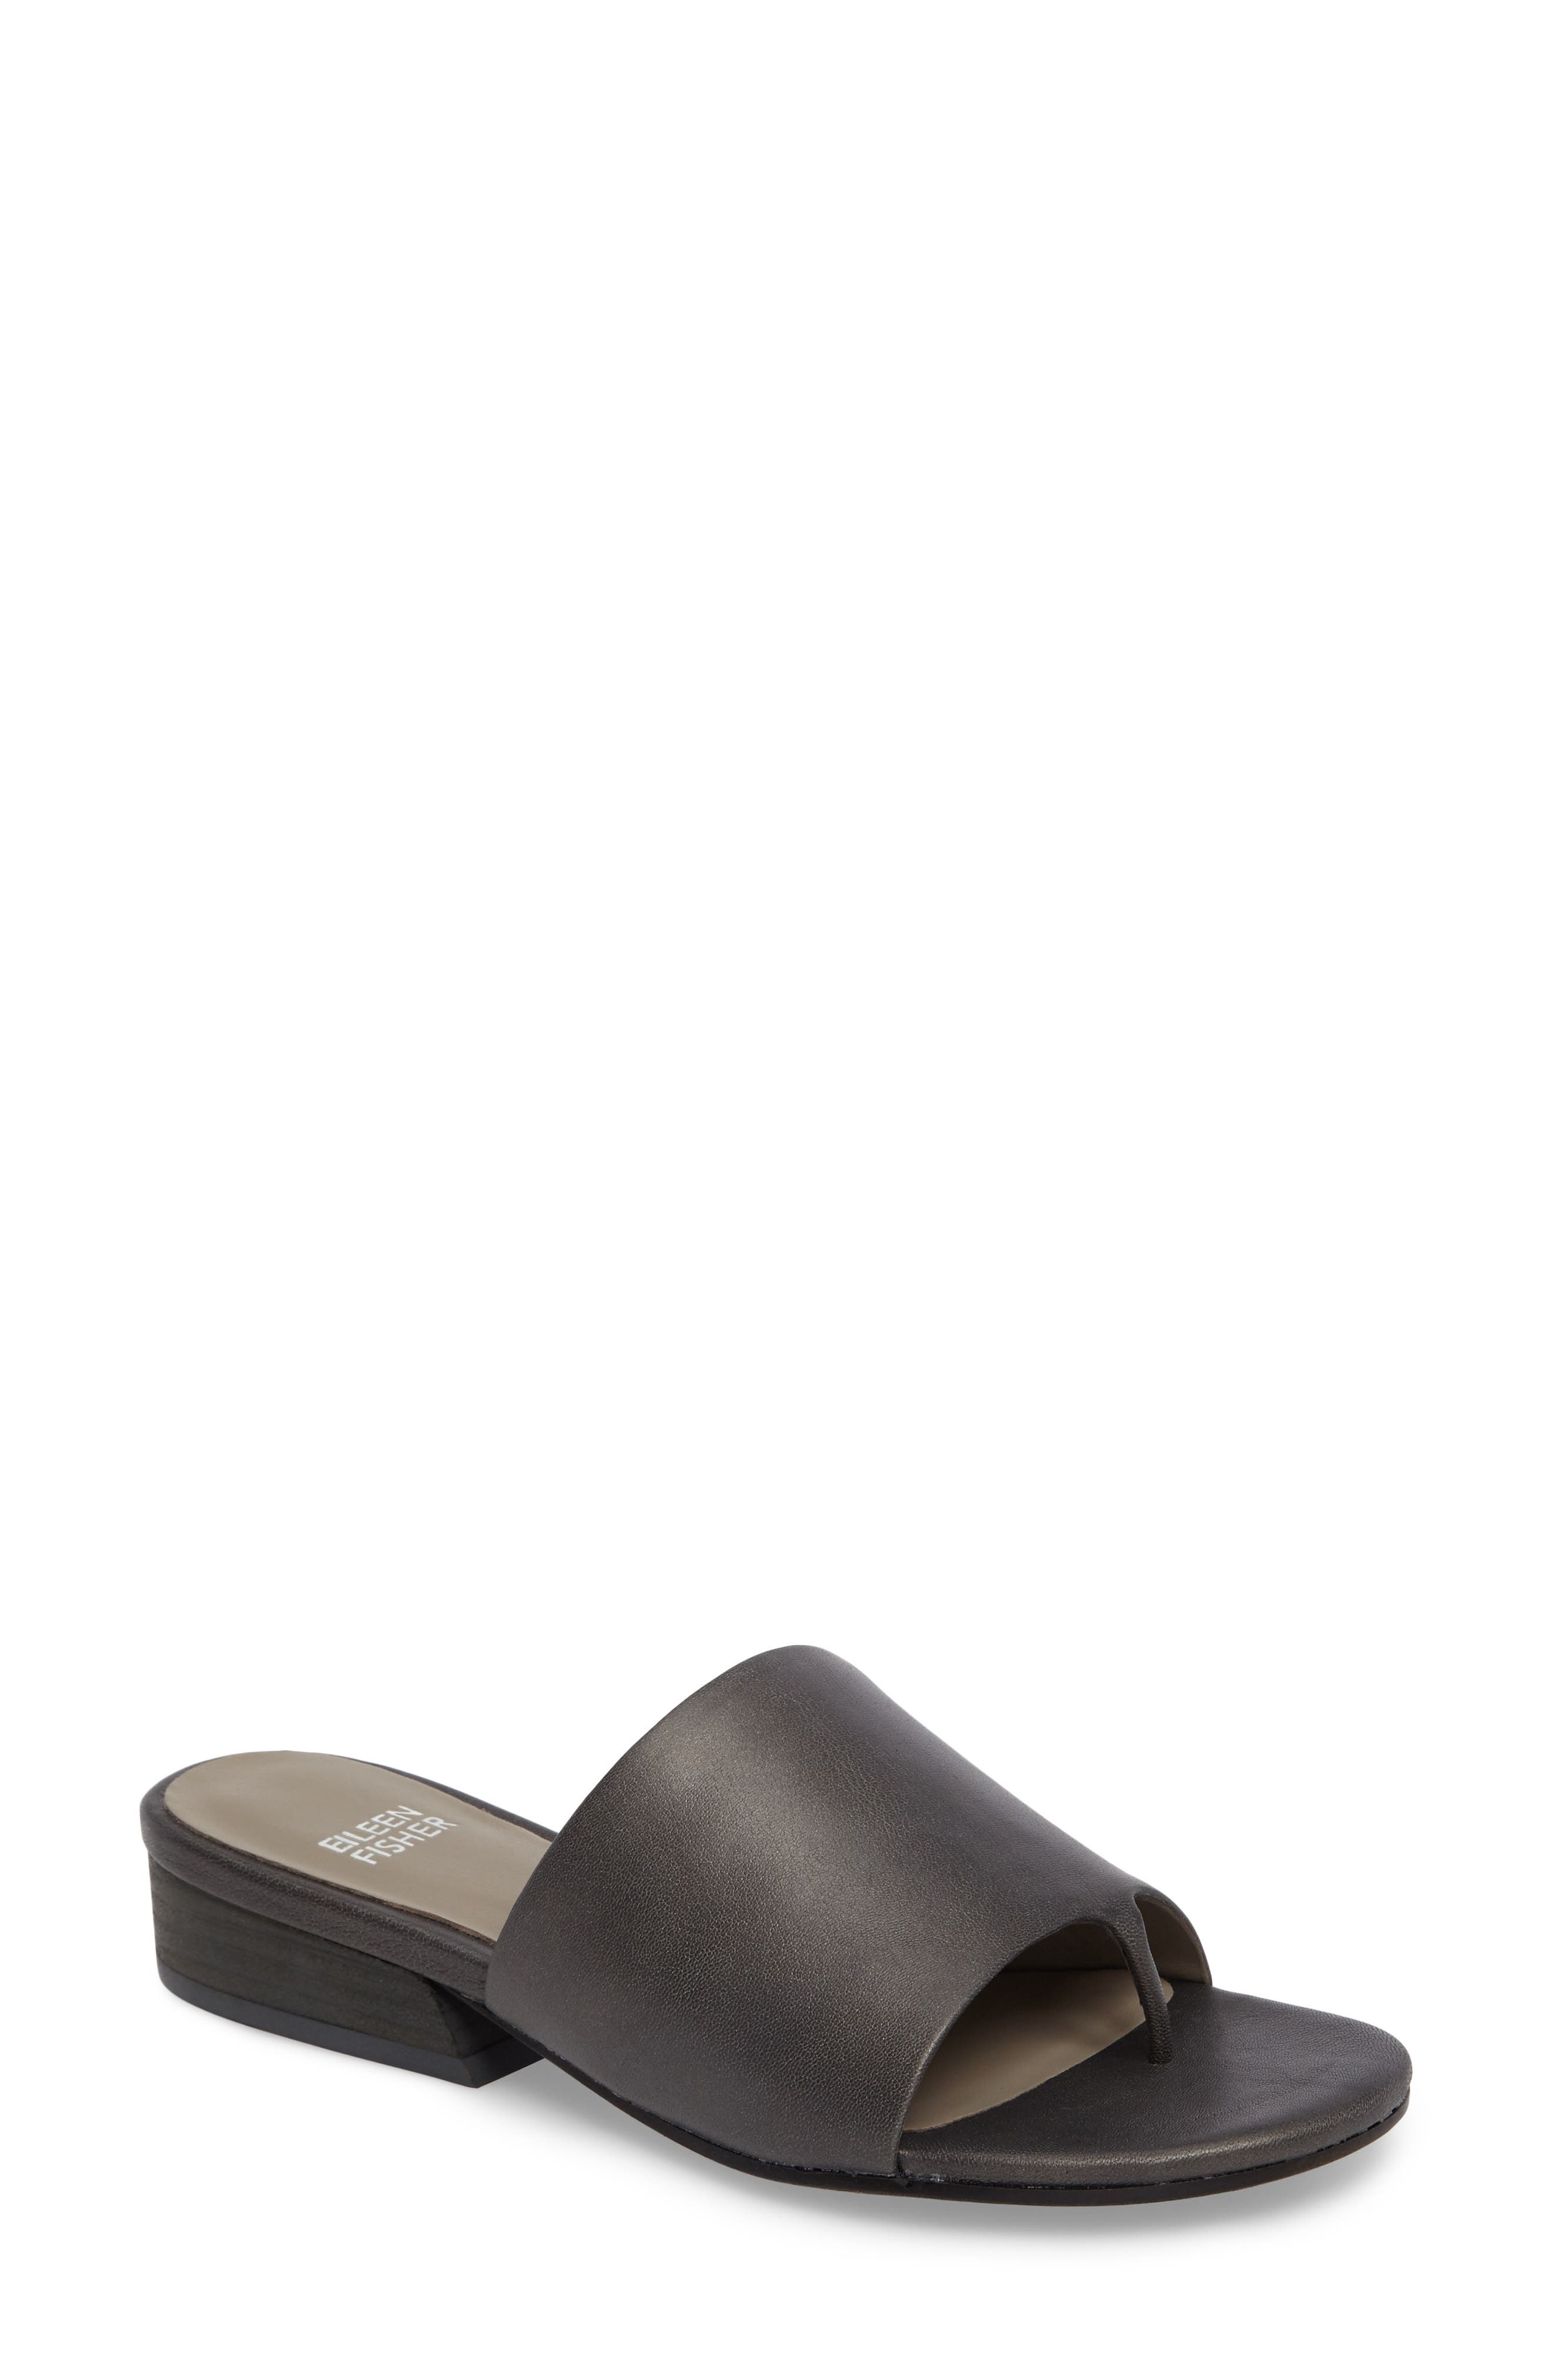 Beal Slide Sandal,                         Main,                         color, 050